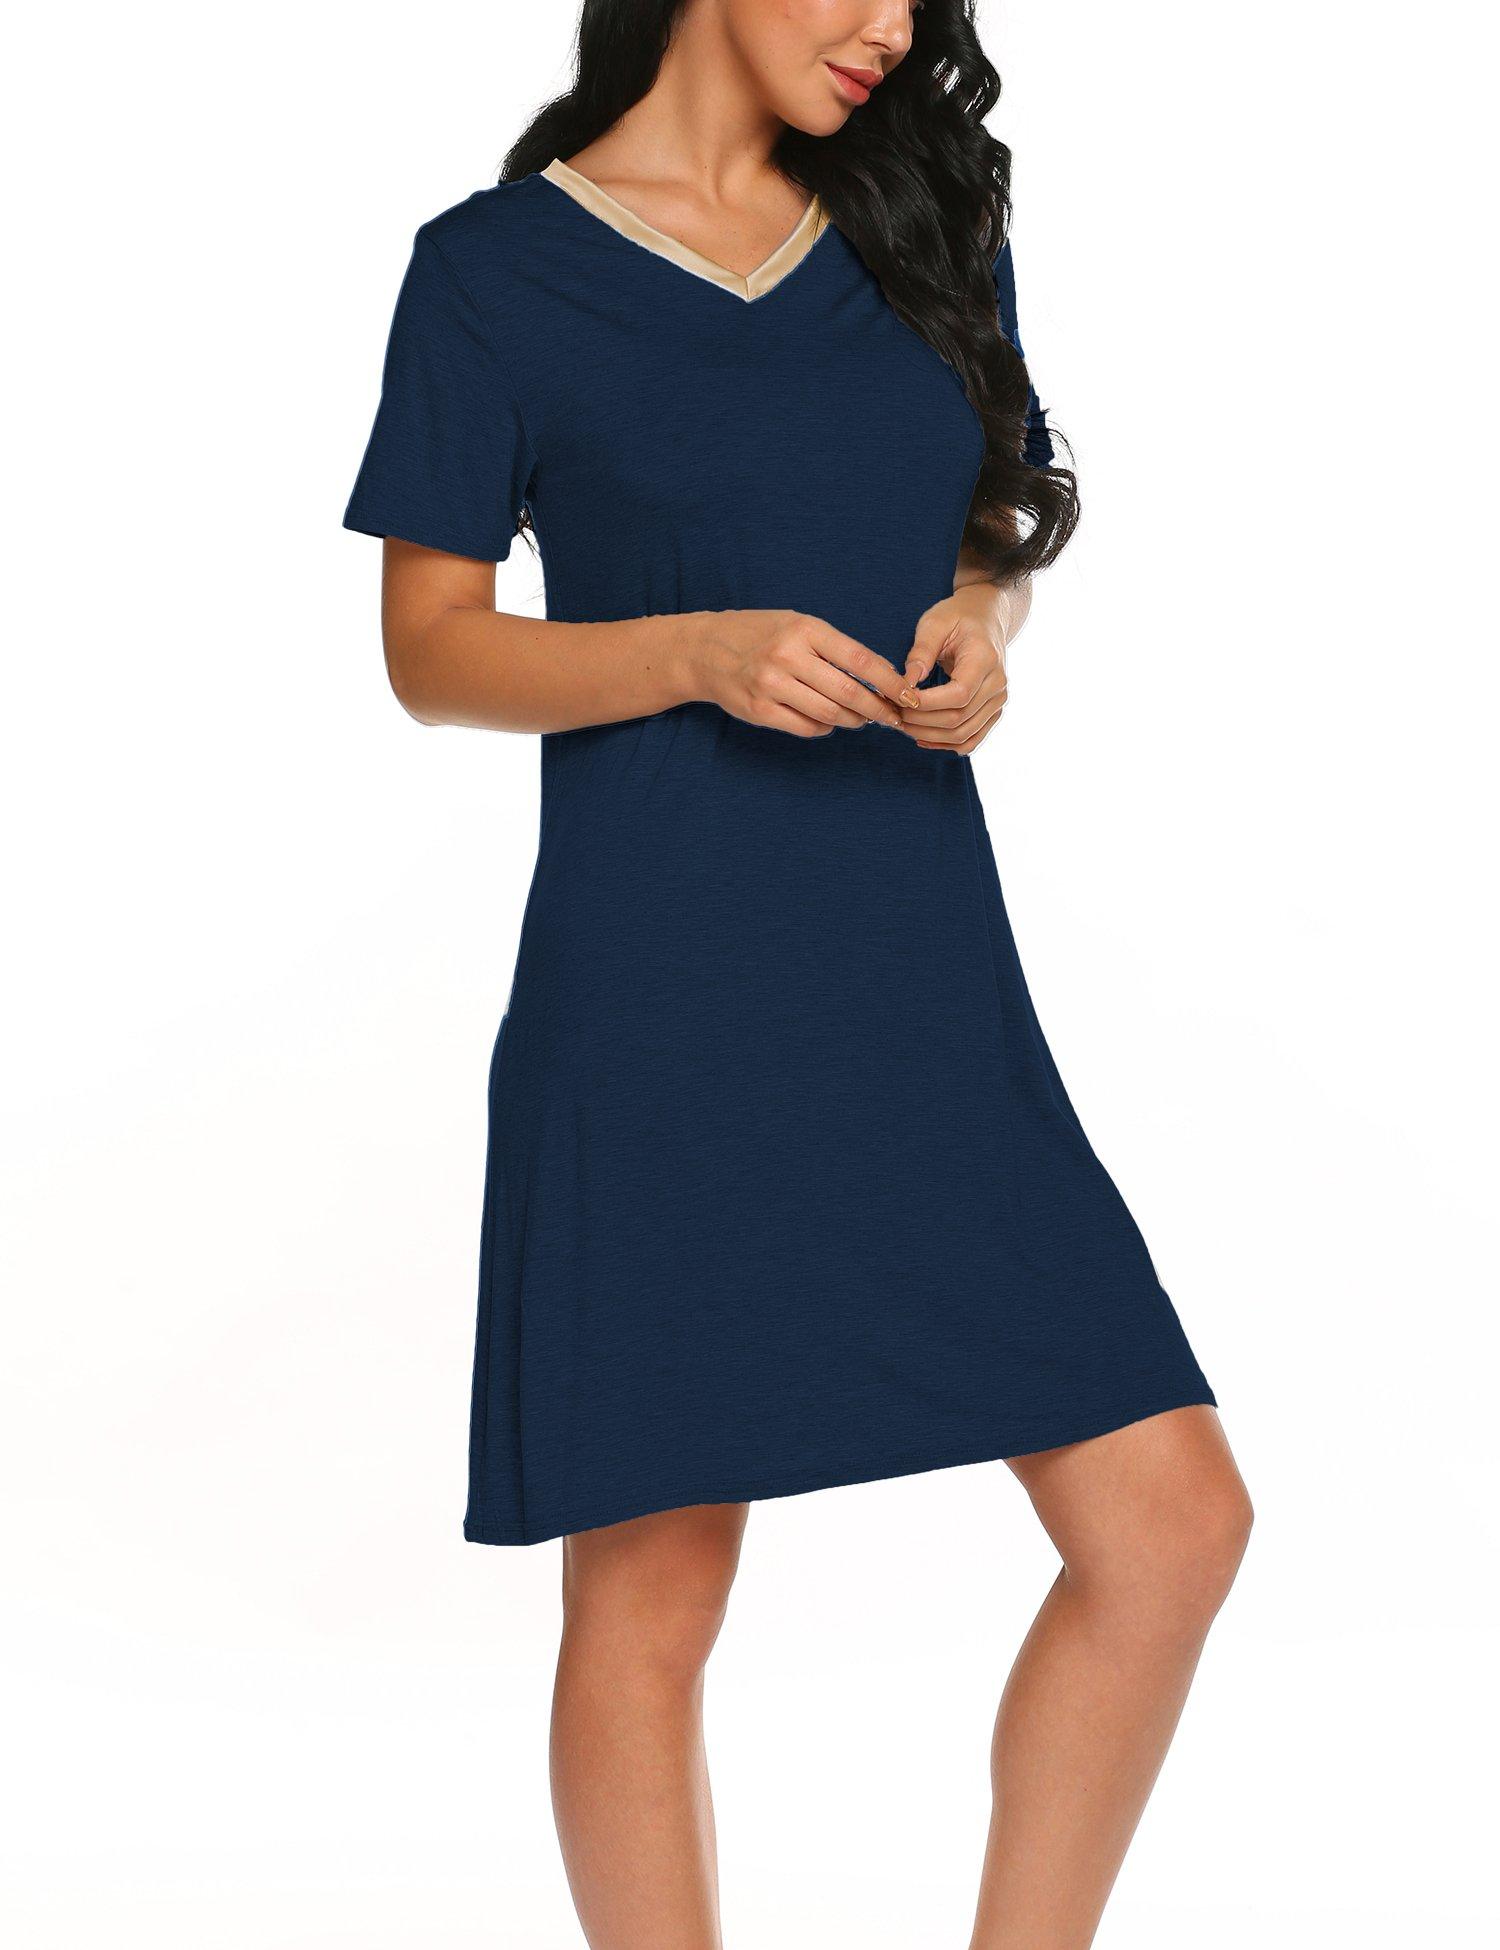 Sweetnight Women Nightgown Short Sleeve Scoop Neck Sleepwear Lace Trim Sleep Shirt Night Dress (Navy blue1, XXL)